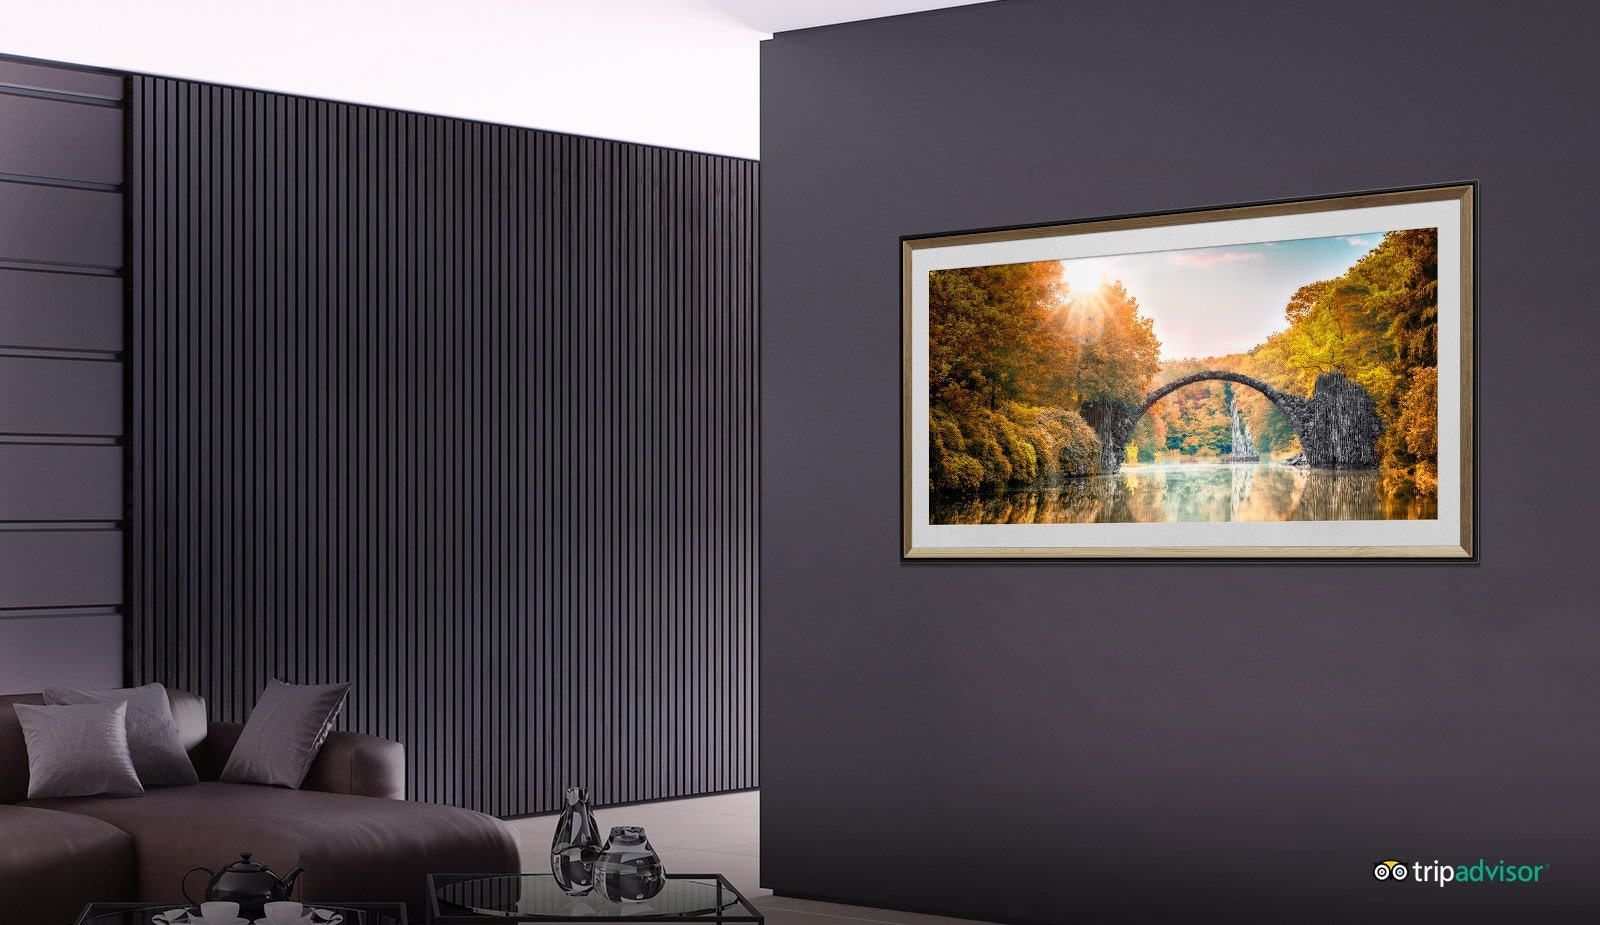 TV-OLED-B9-08-Gallery-Mode-Desktop